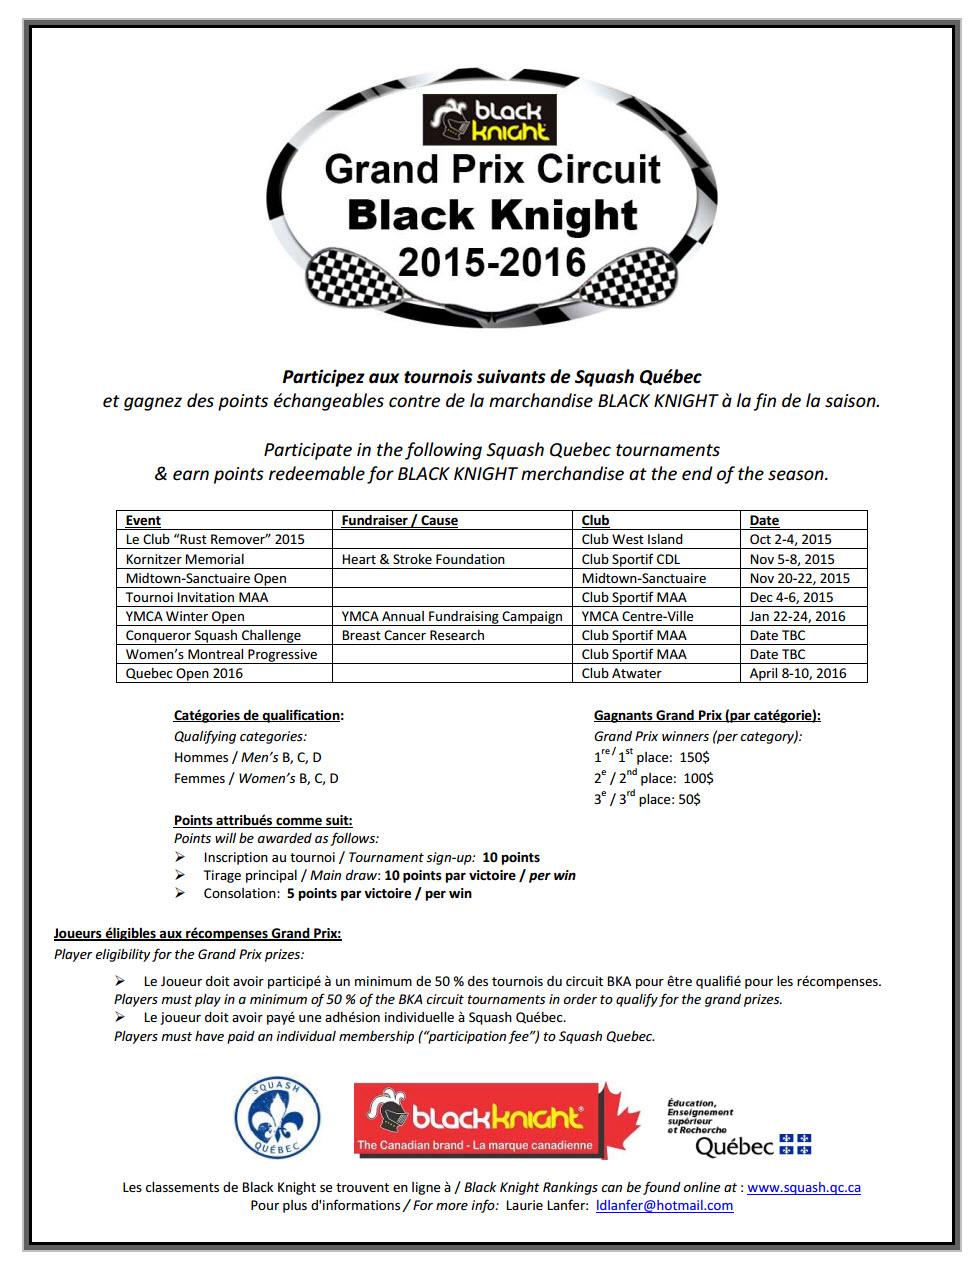 bk grand prix 2015